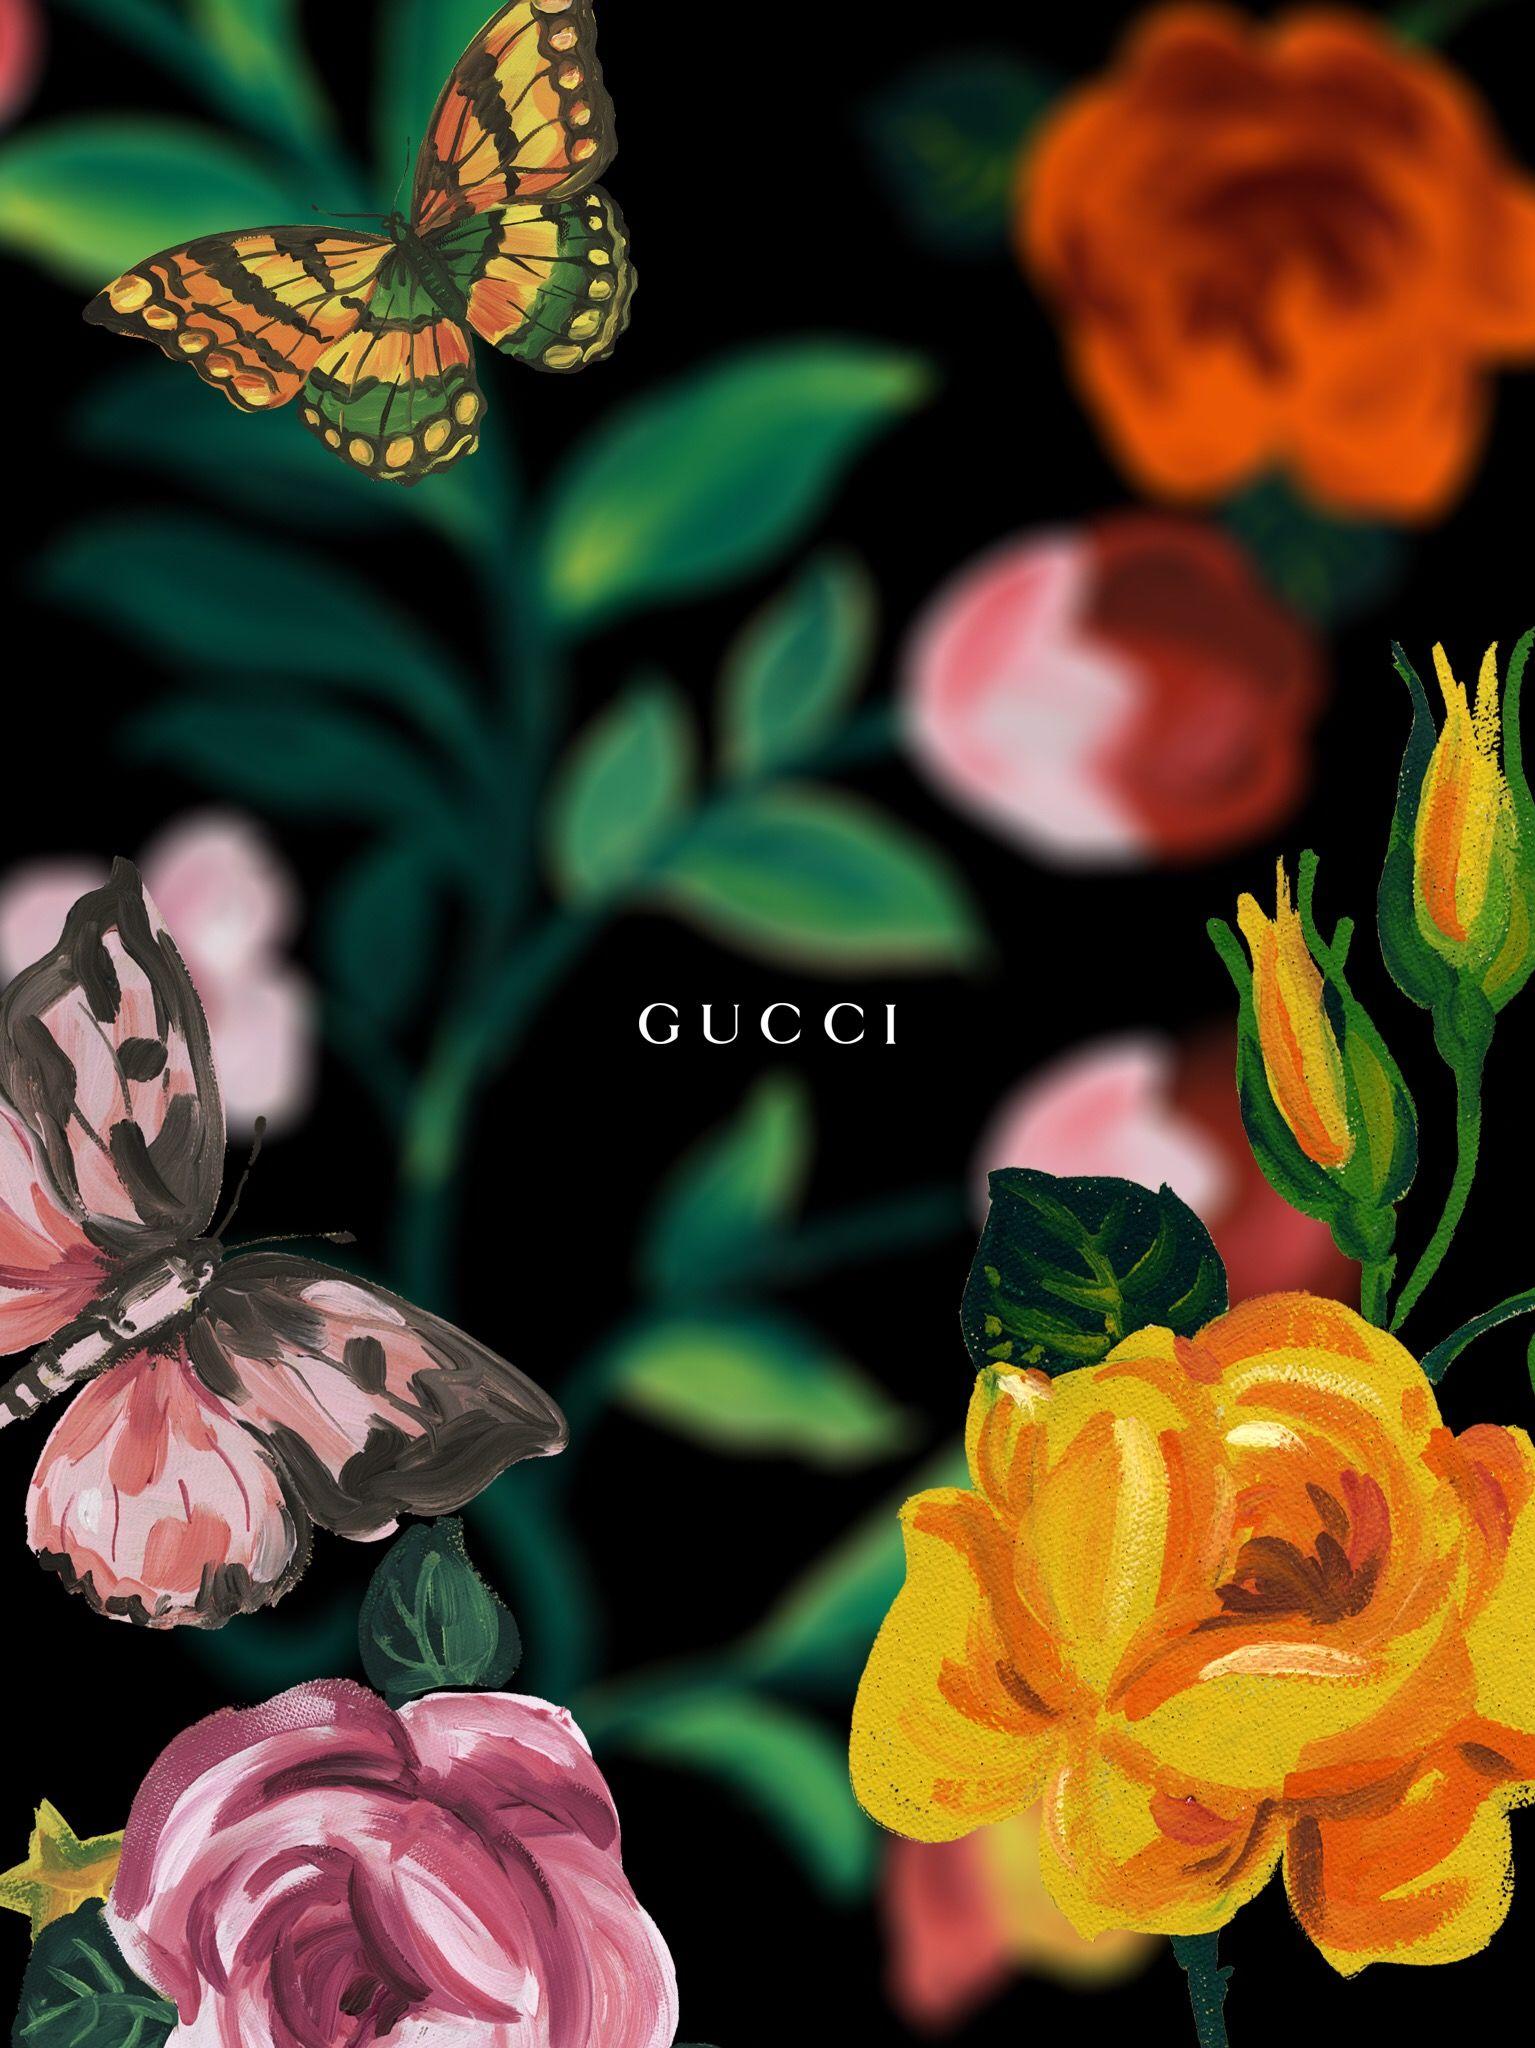 Pin by elma kaba on a r t gucci wallpaper iphone - Gucci desktop wallpaper ...